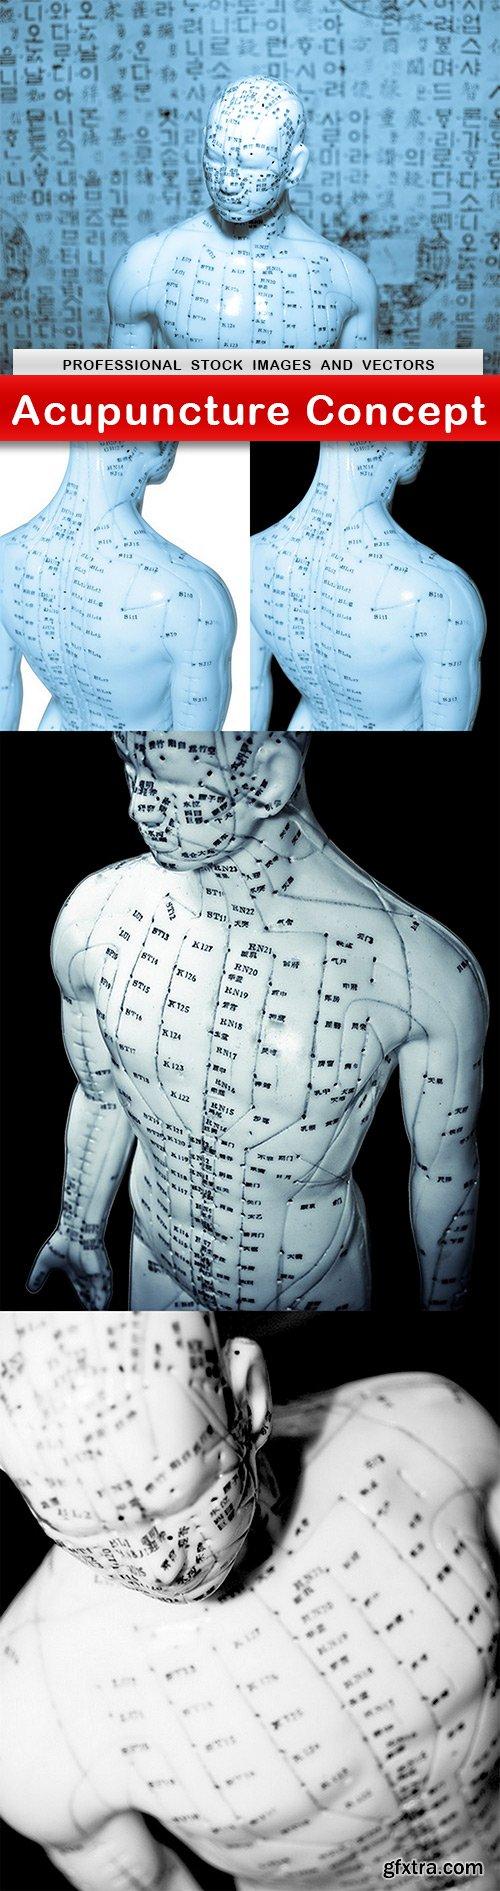 Acupuncture Concept - 5 UHQ JPEG